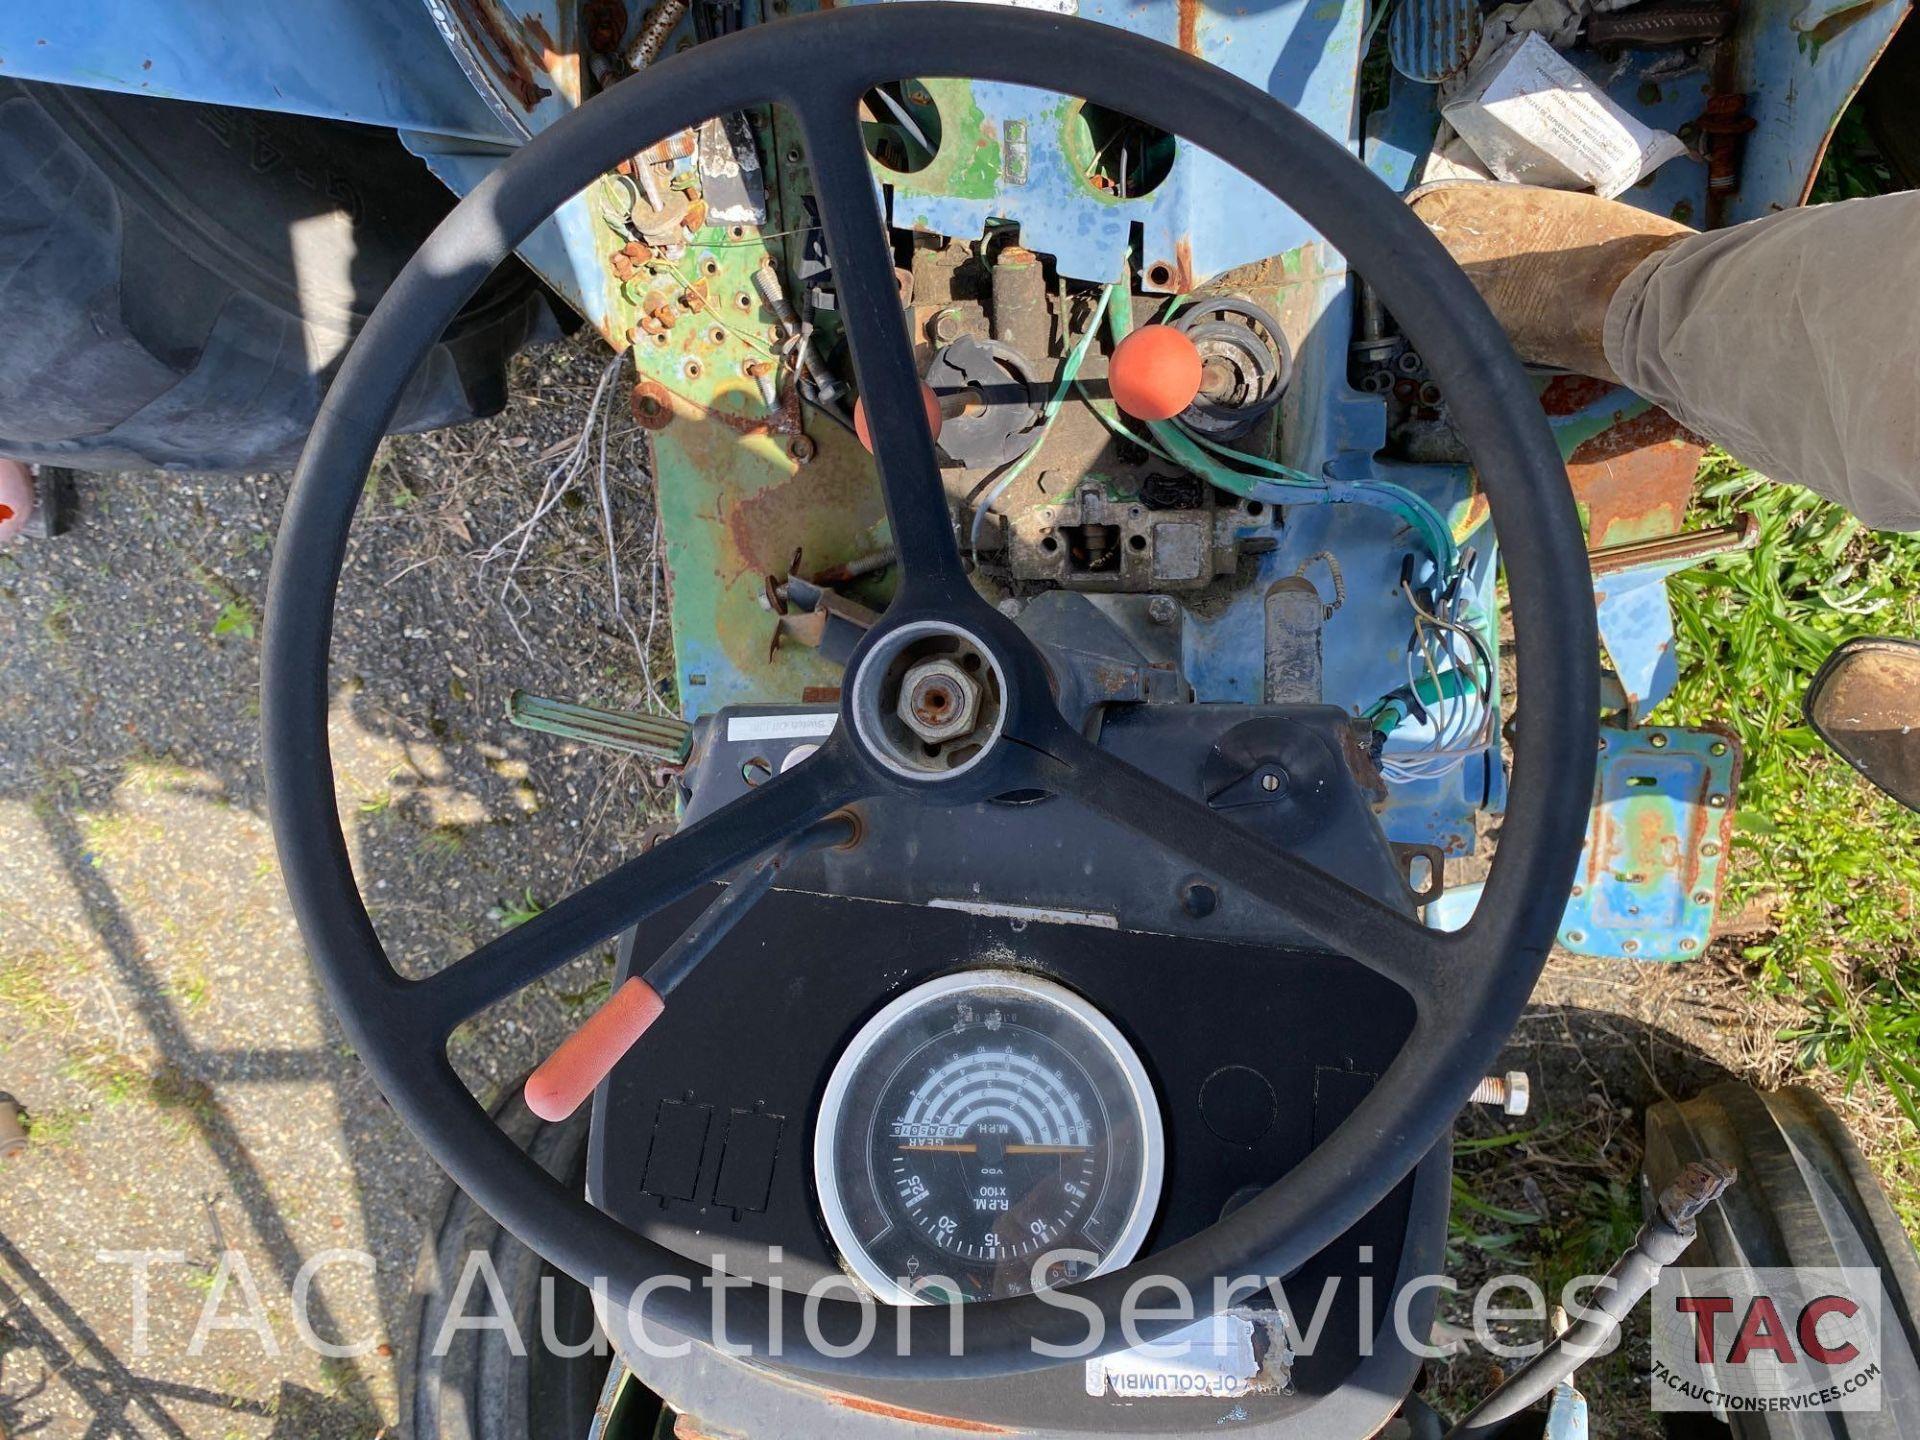 John Deere 2150 Farm Tractor - Image 18 of 34